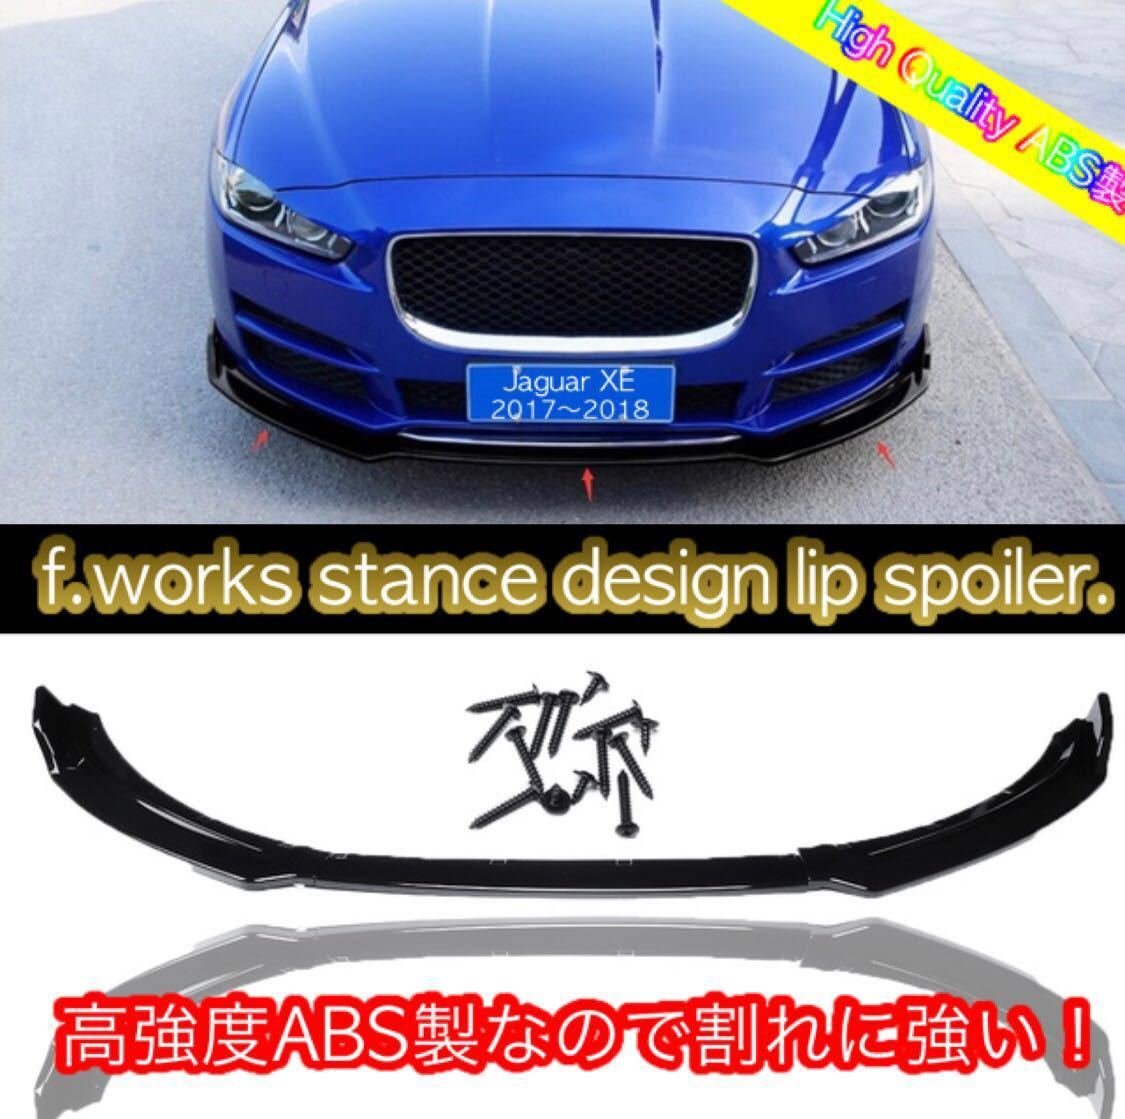 【f.works】汎用 リップスポイラー 高品質ABS for ジャガー jaguar XE ヴェルファイア アルファード※様々な車種に適合!レクサス UX VOXY